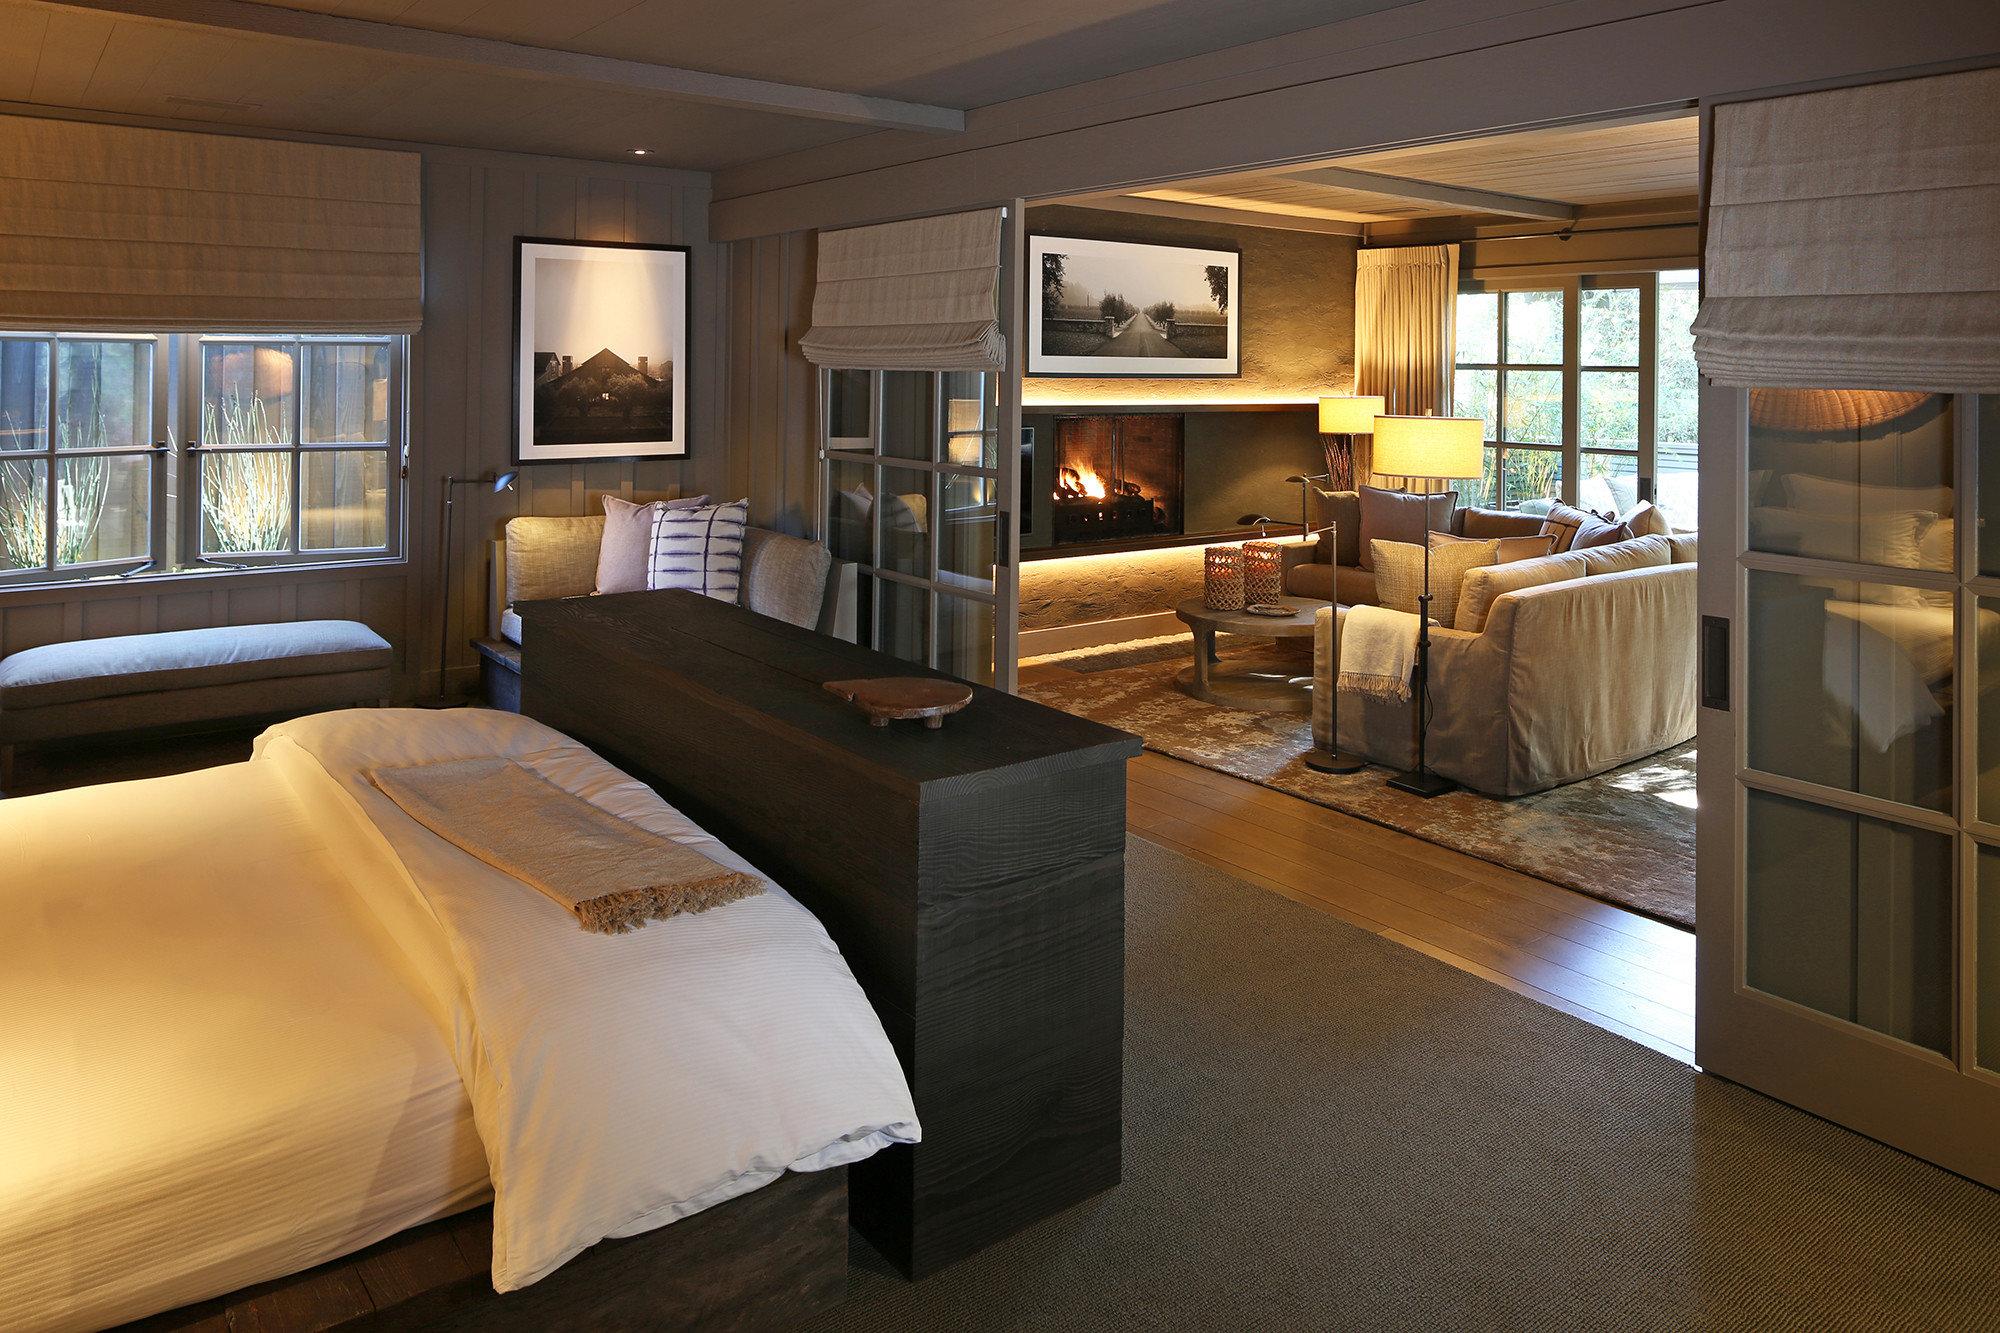 sofa Suite Bedroom bed frame flooring penthouse apartment hardwood